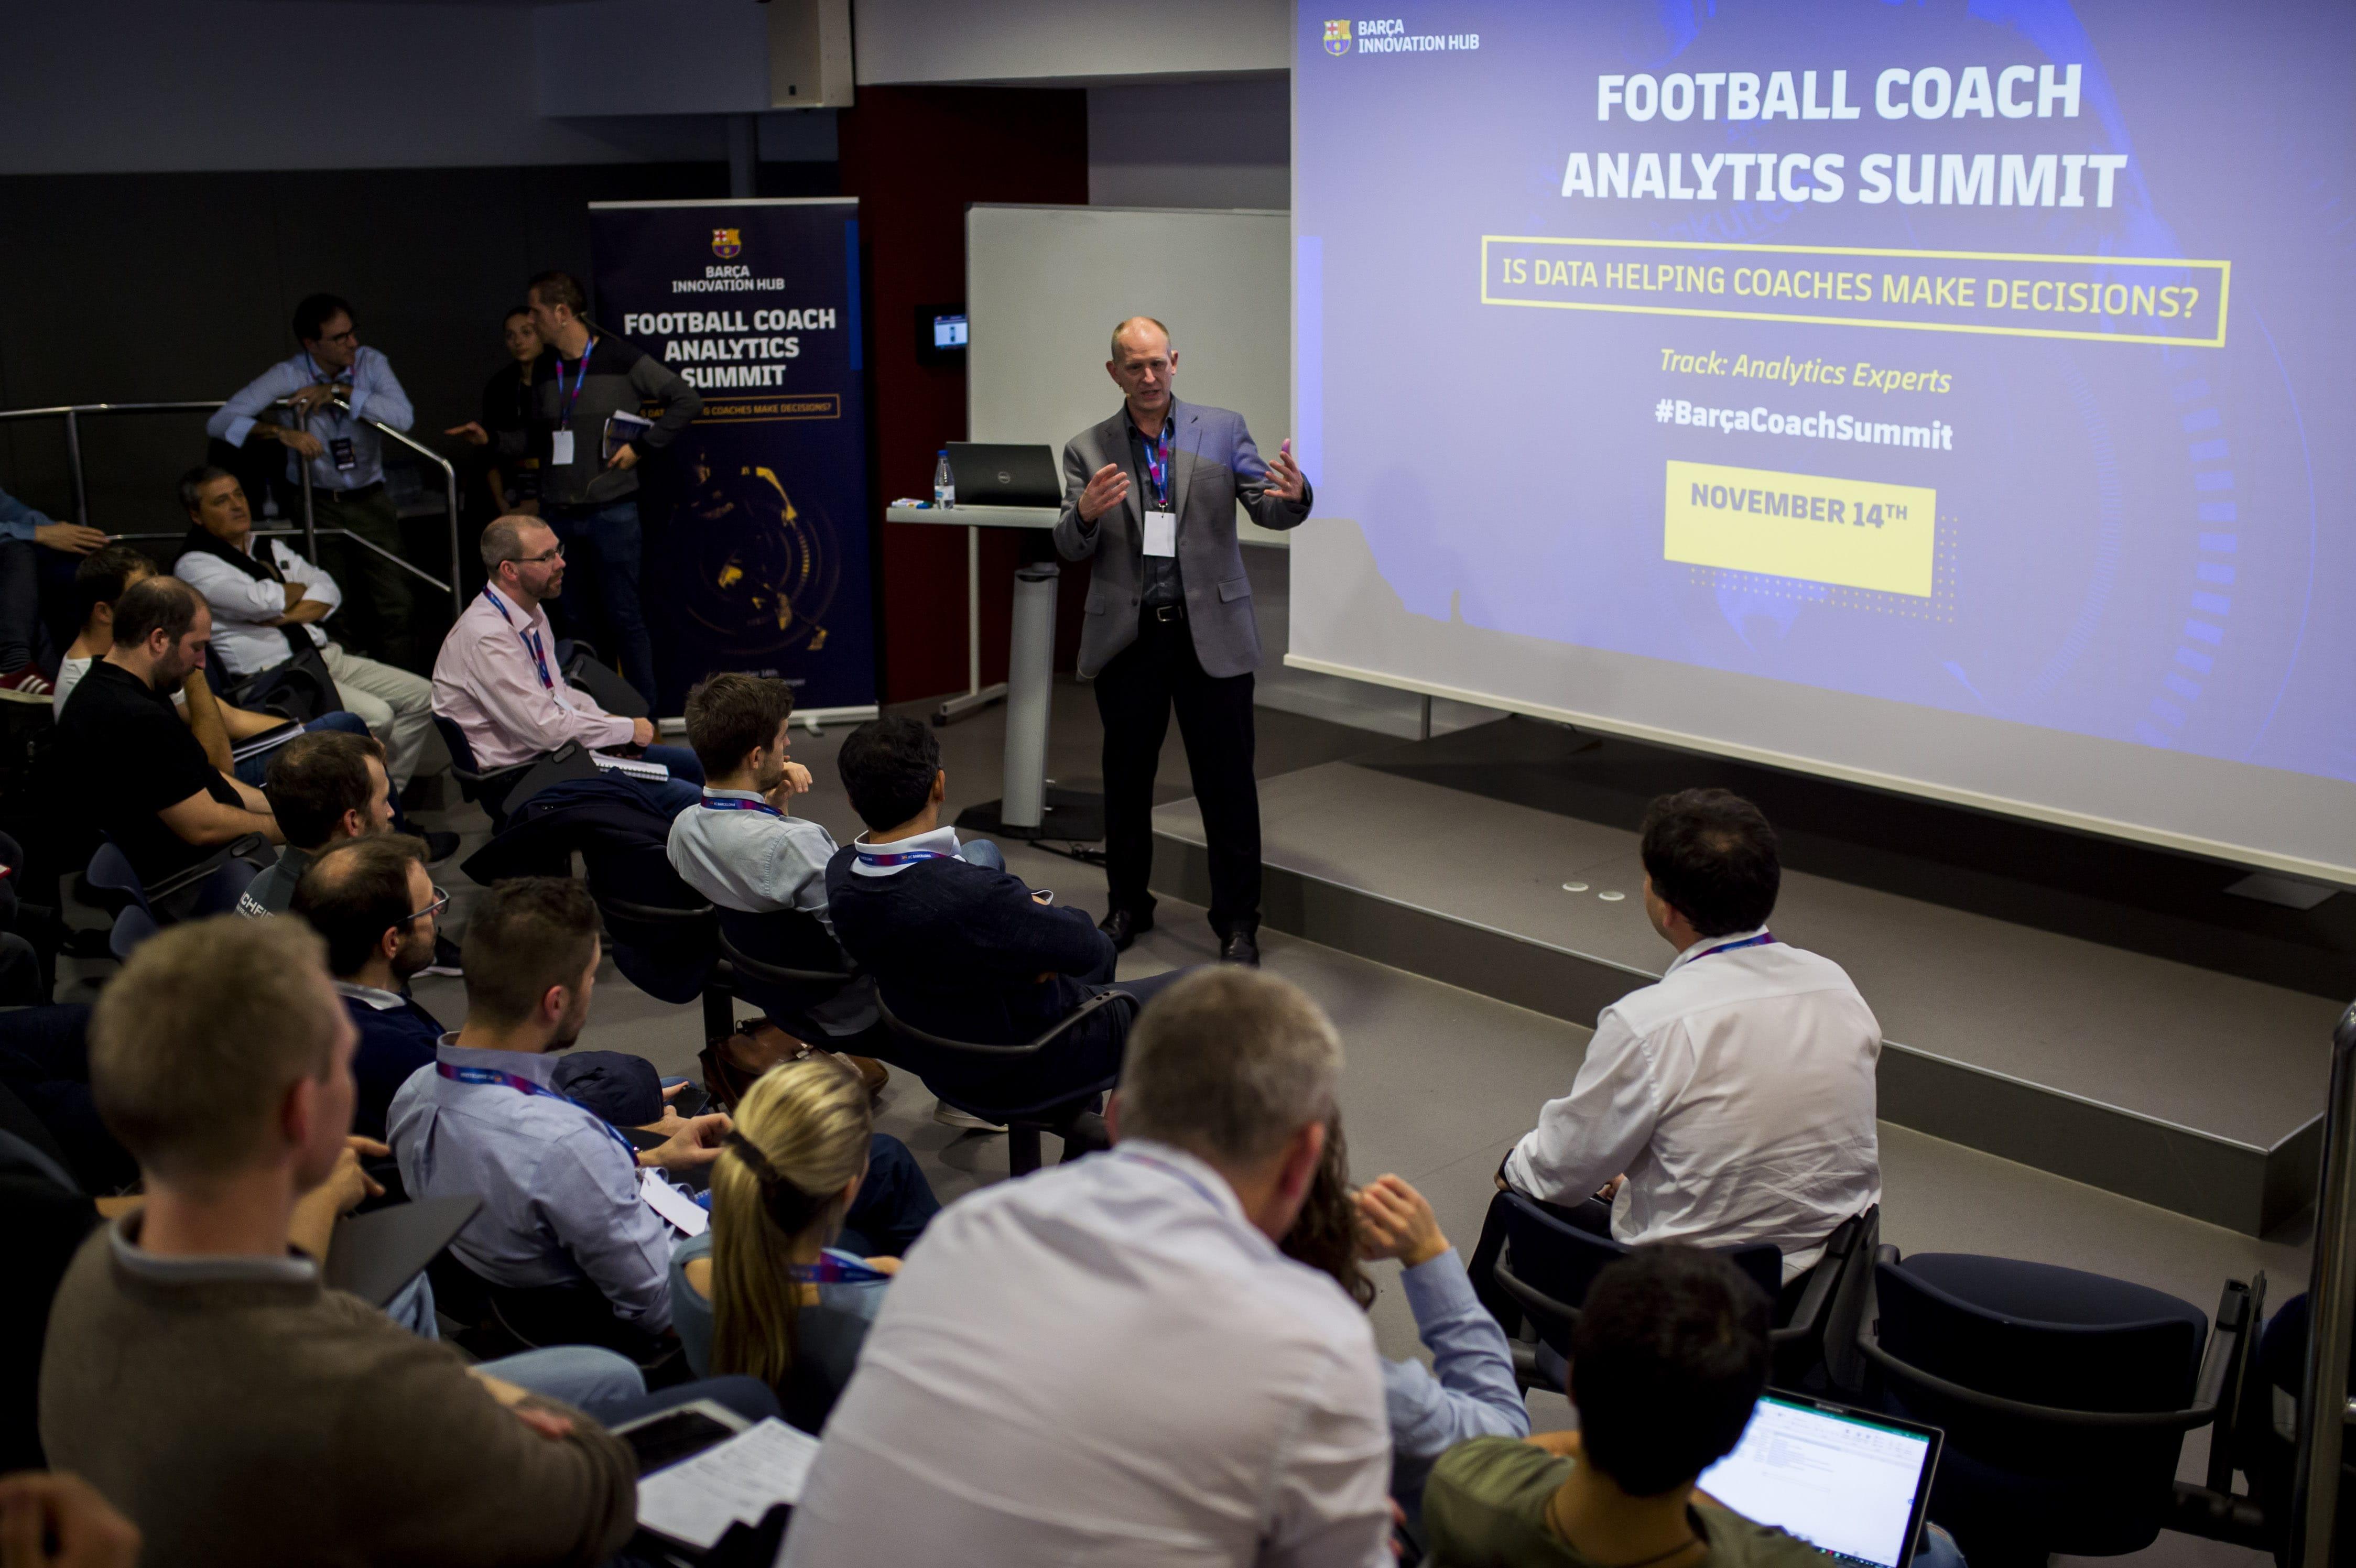 2018-11-14 FOOTBALL COACH ANALYTICS SUMMIT 105-min - Barça